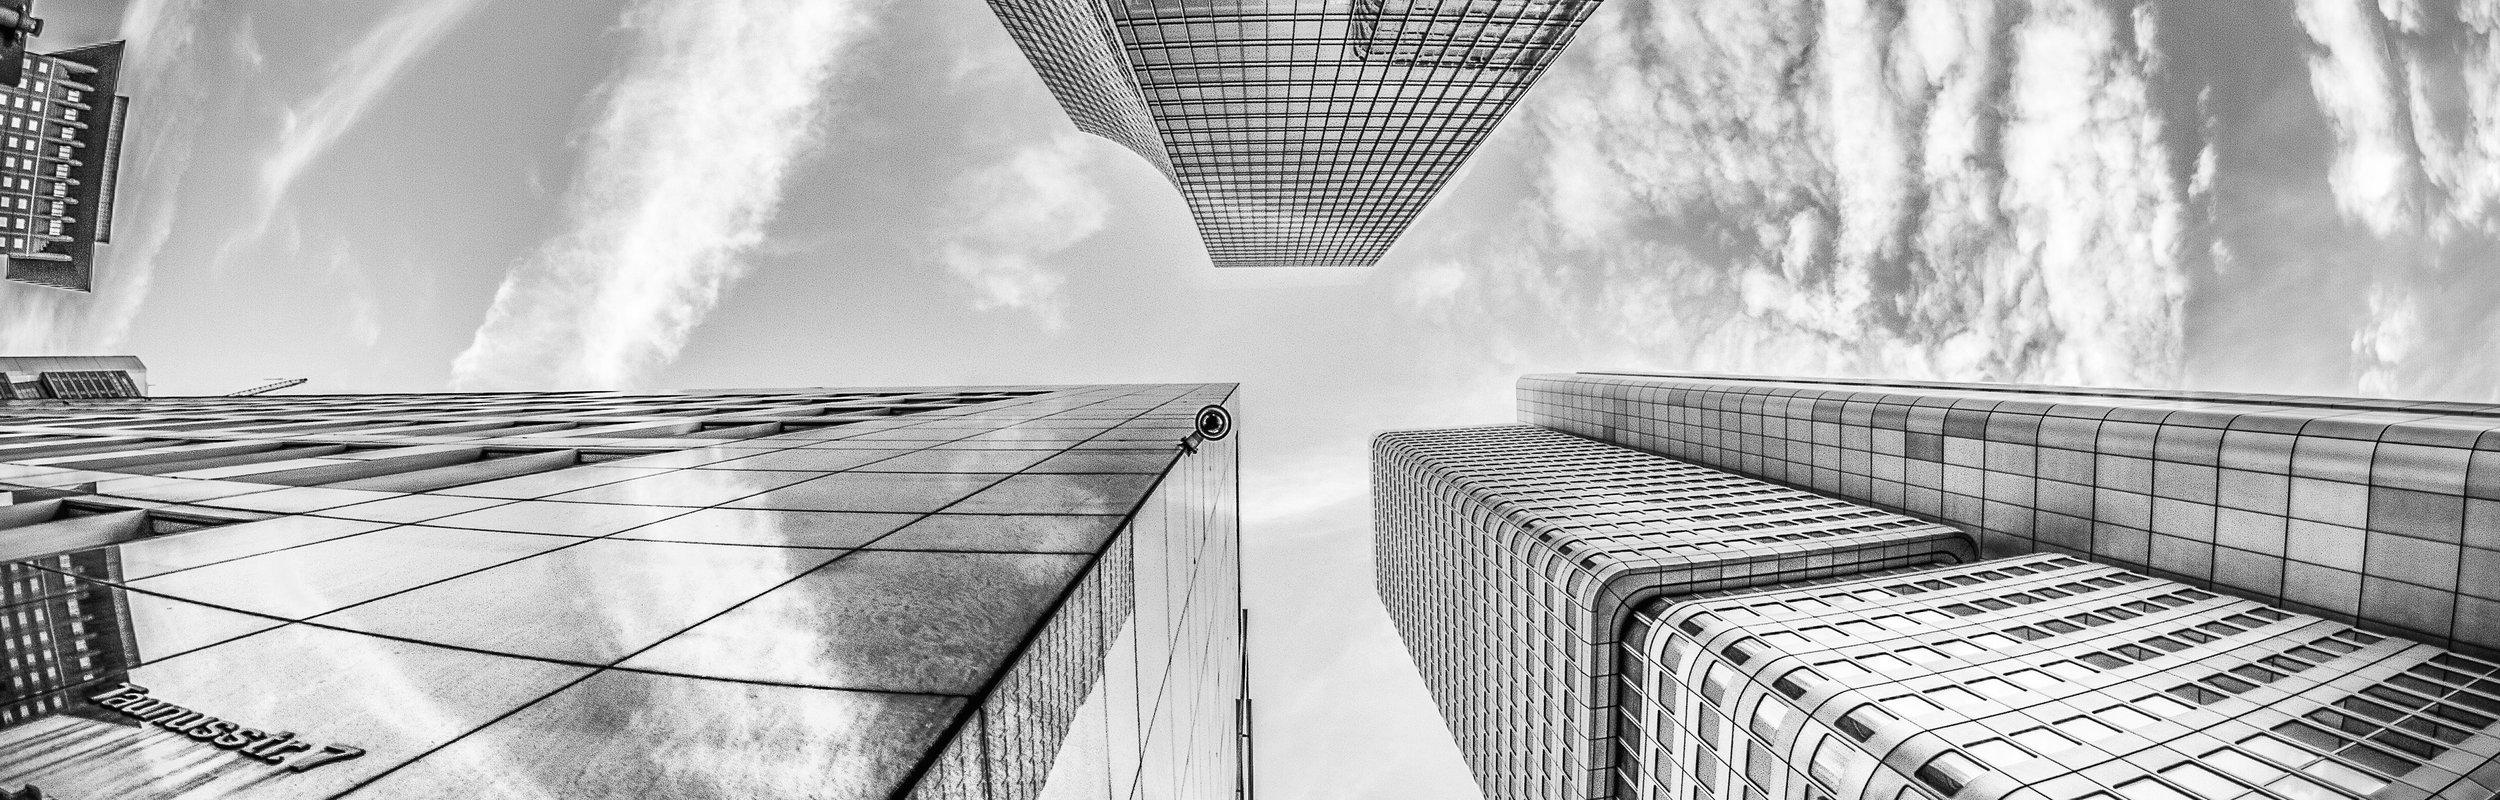 architectural-design-architecture-buildings-830891.jpg